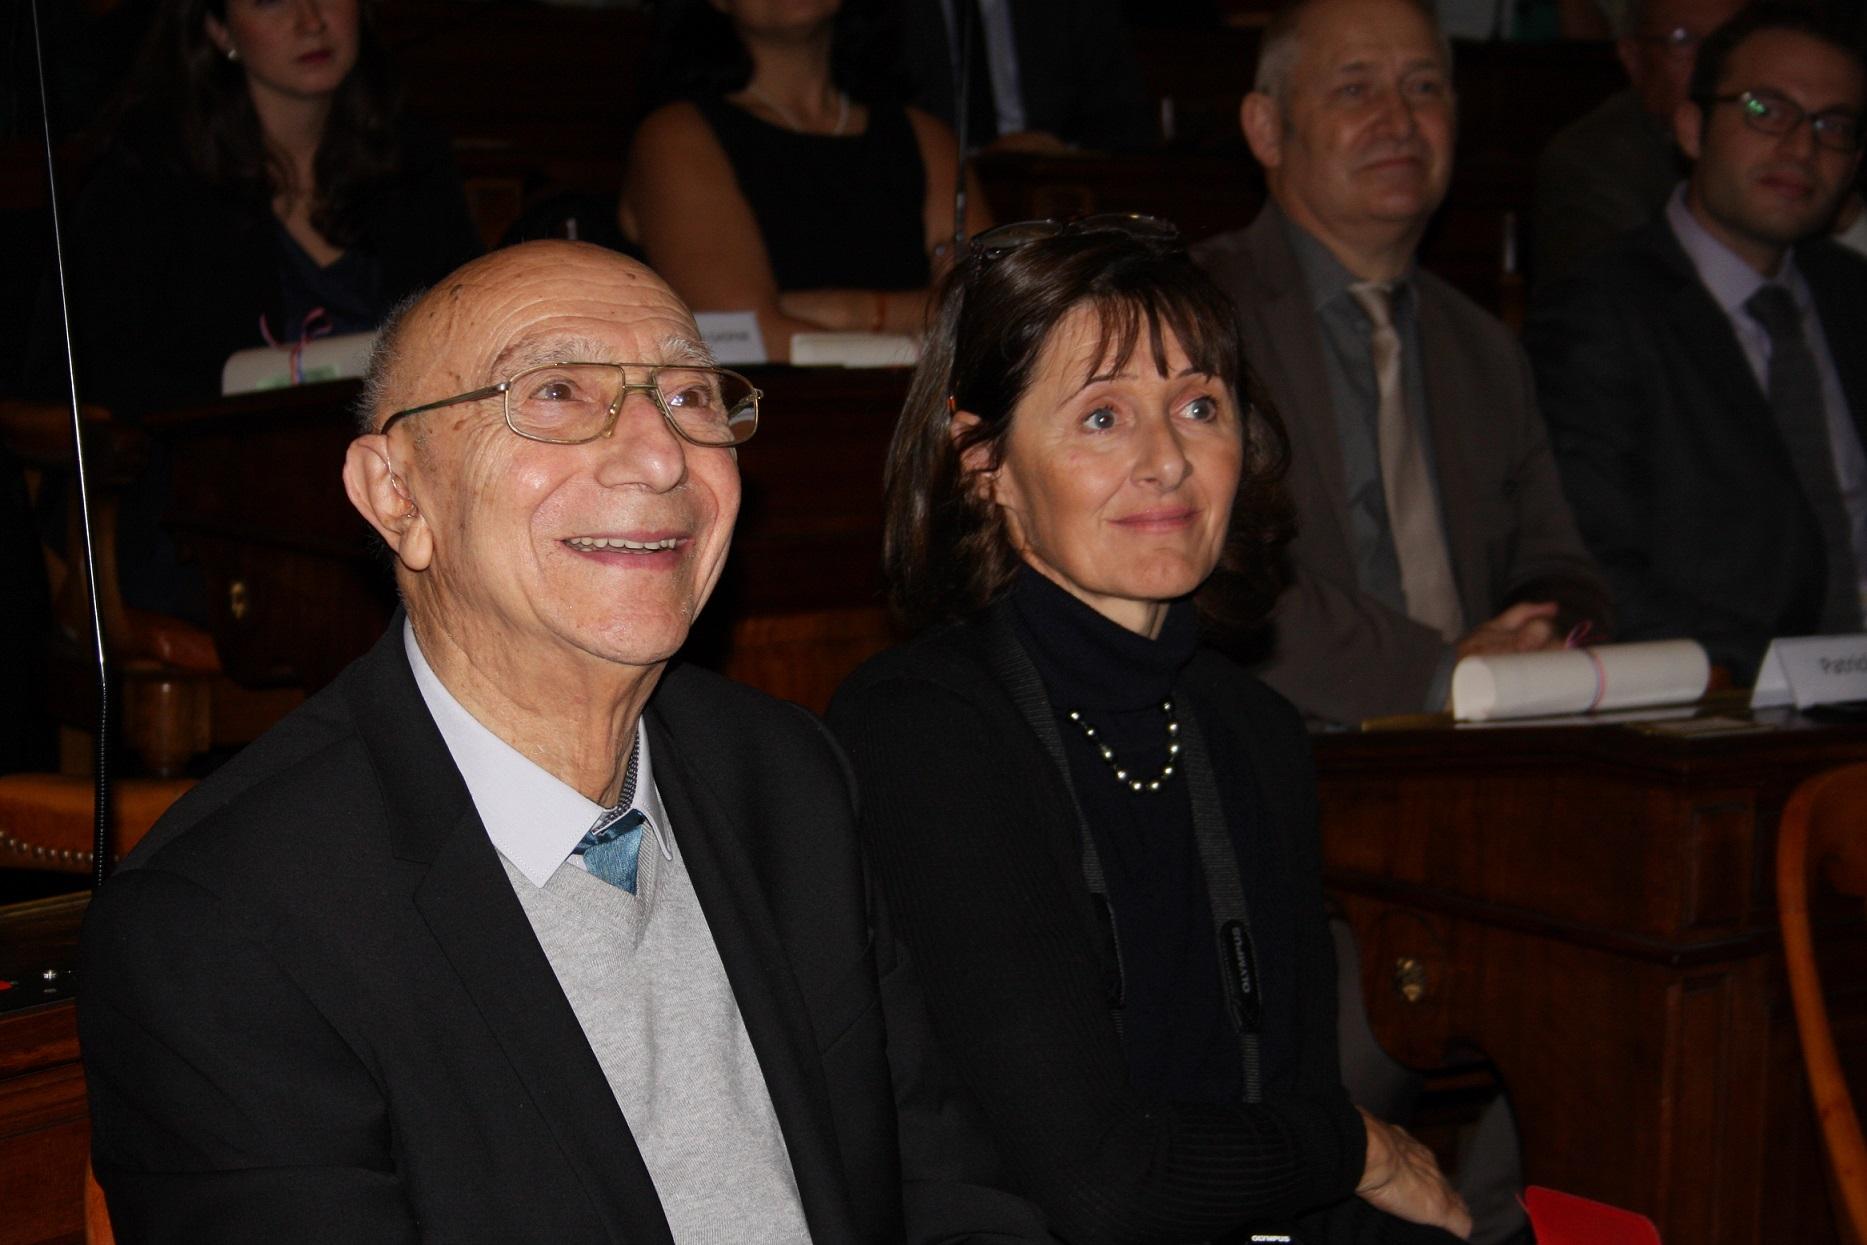 Prix Jean Bernard_2015_Charles Lanot à l'ANM_15.12.2015